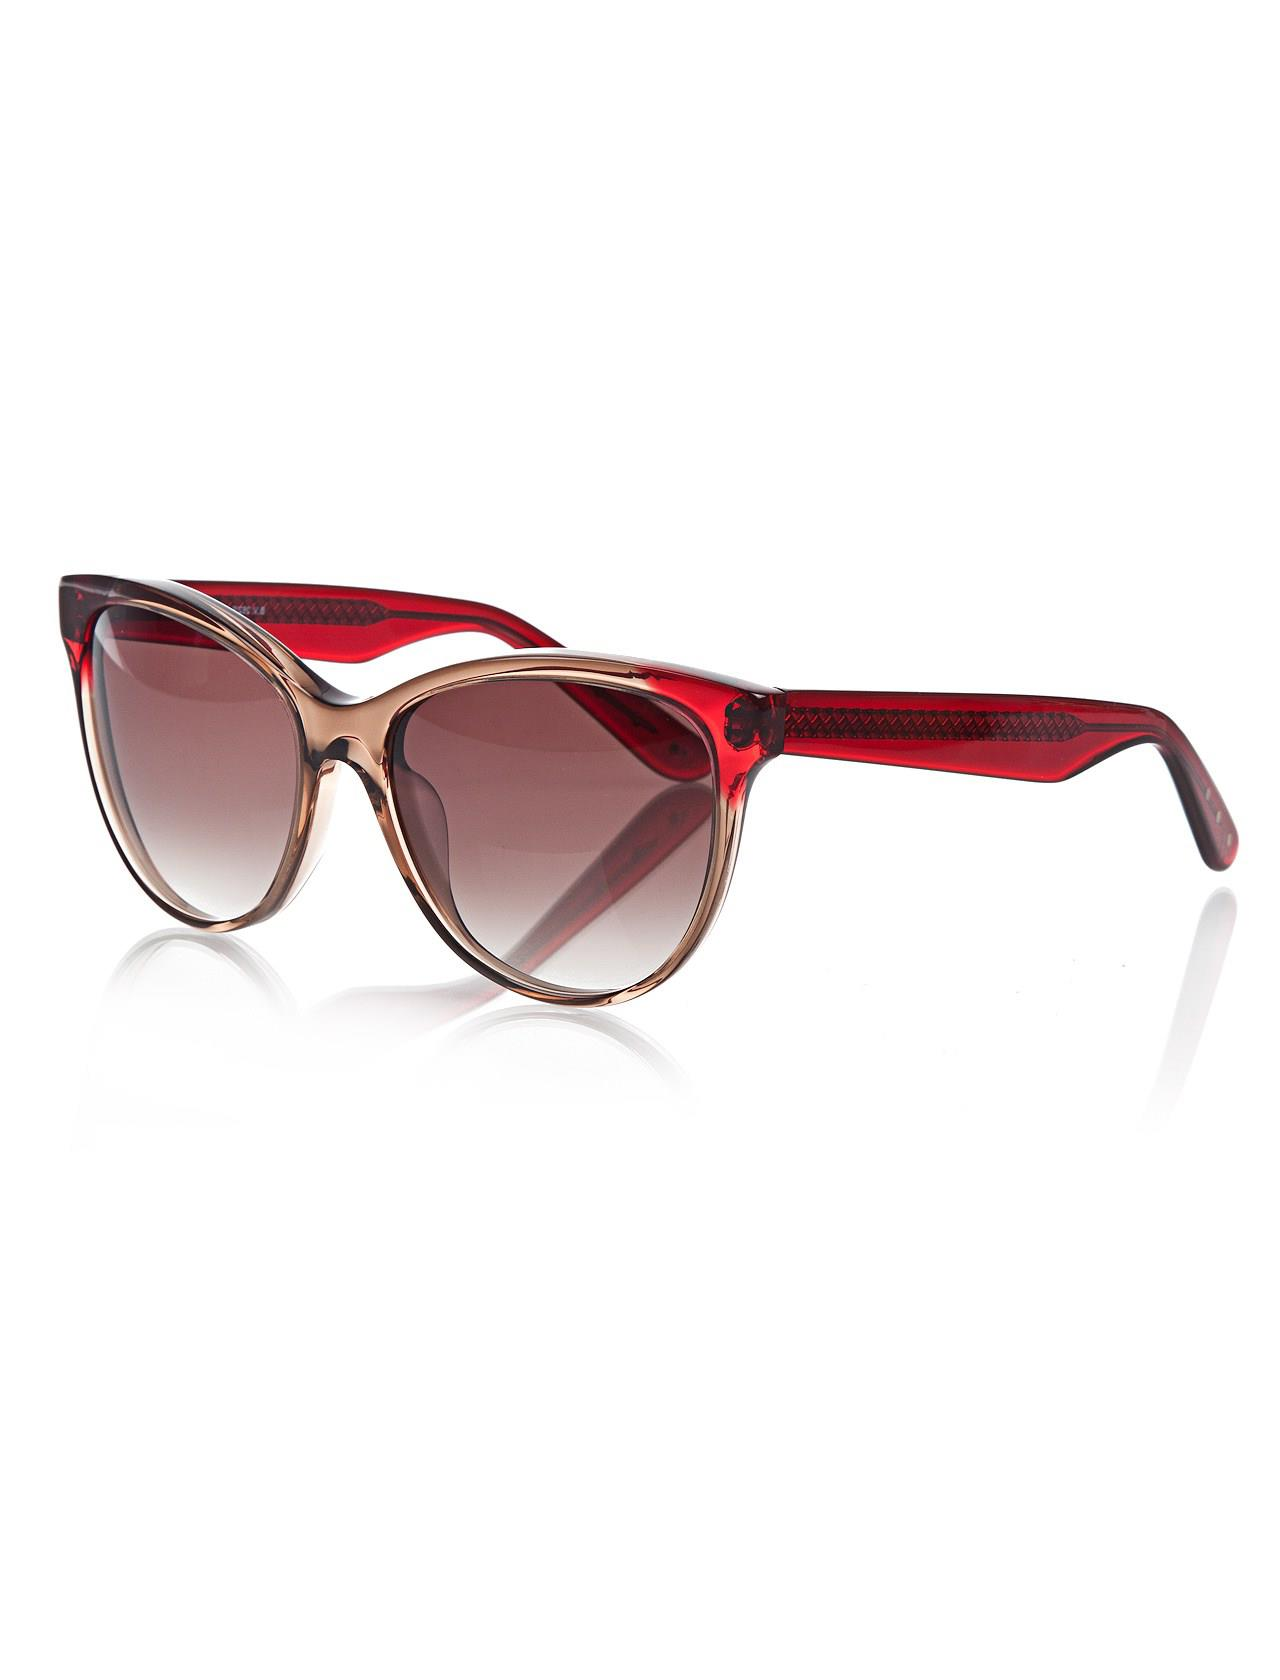 Women's sunglasses b.v 262/s 4ct 56 js bone Brown organic oval aval 56-17-140 bottega veneta